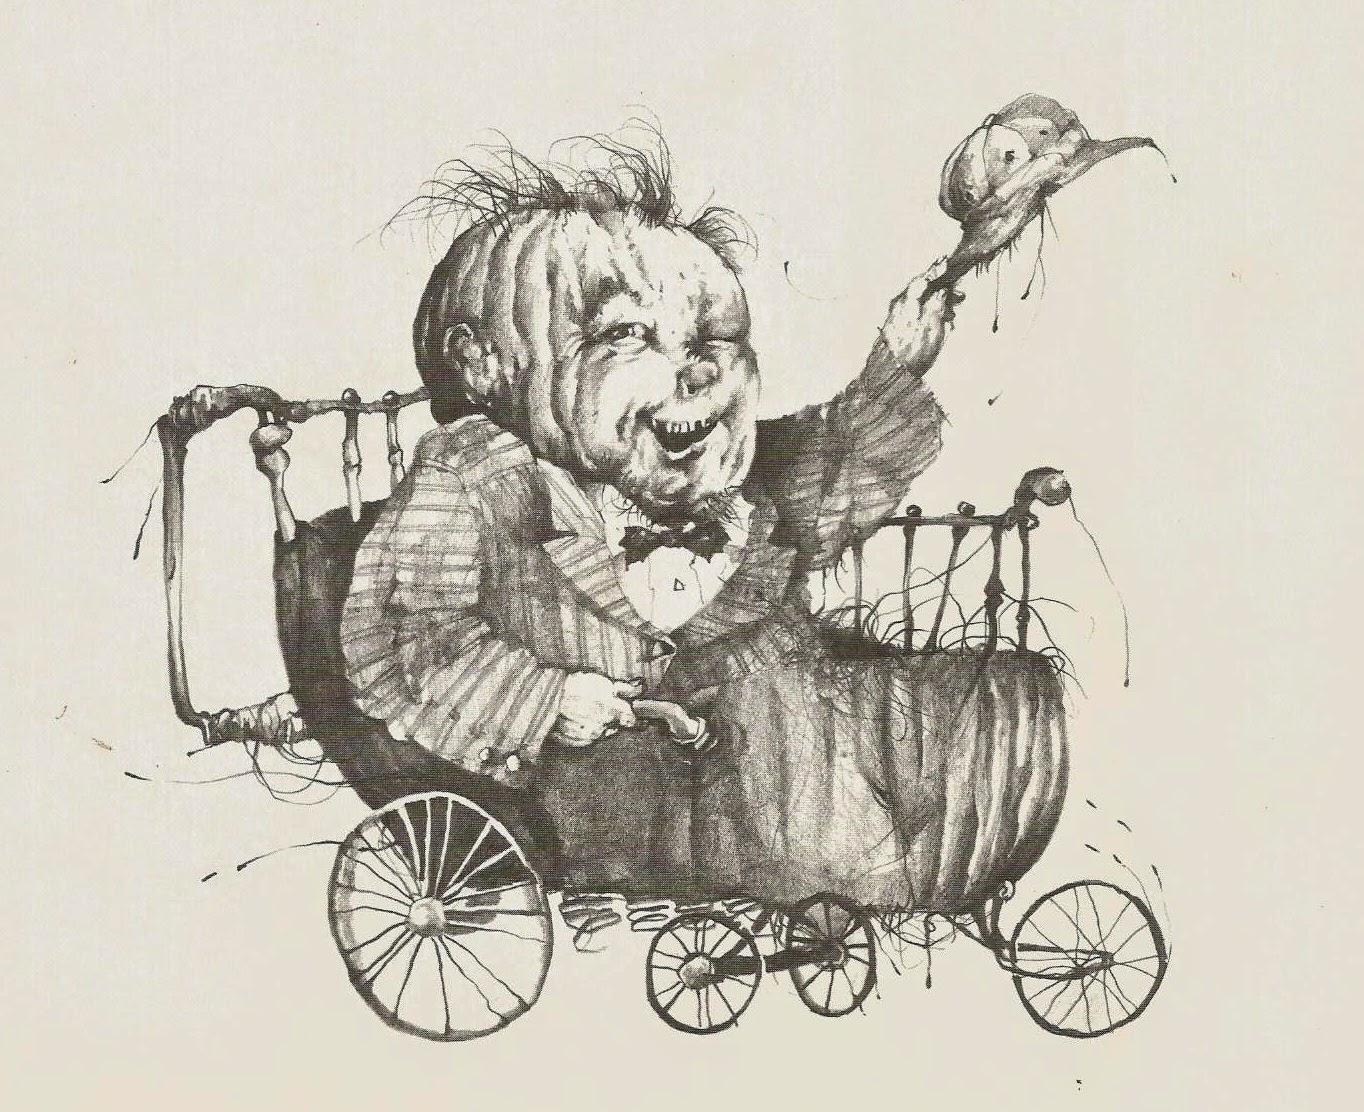 more stephen gammell: the eerie series & halloween poems